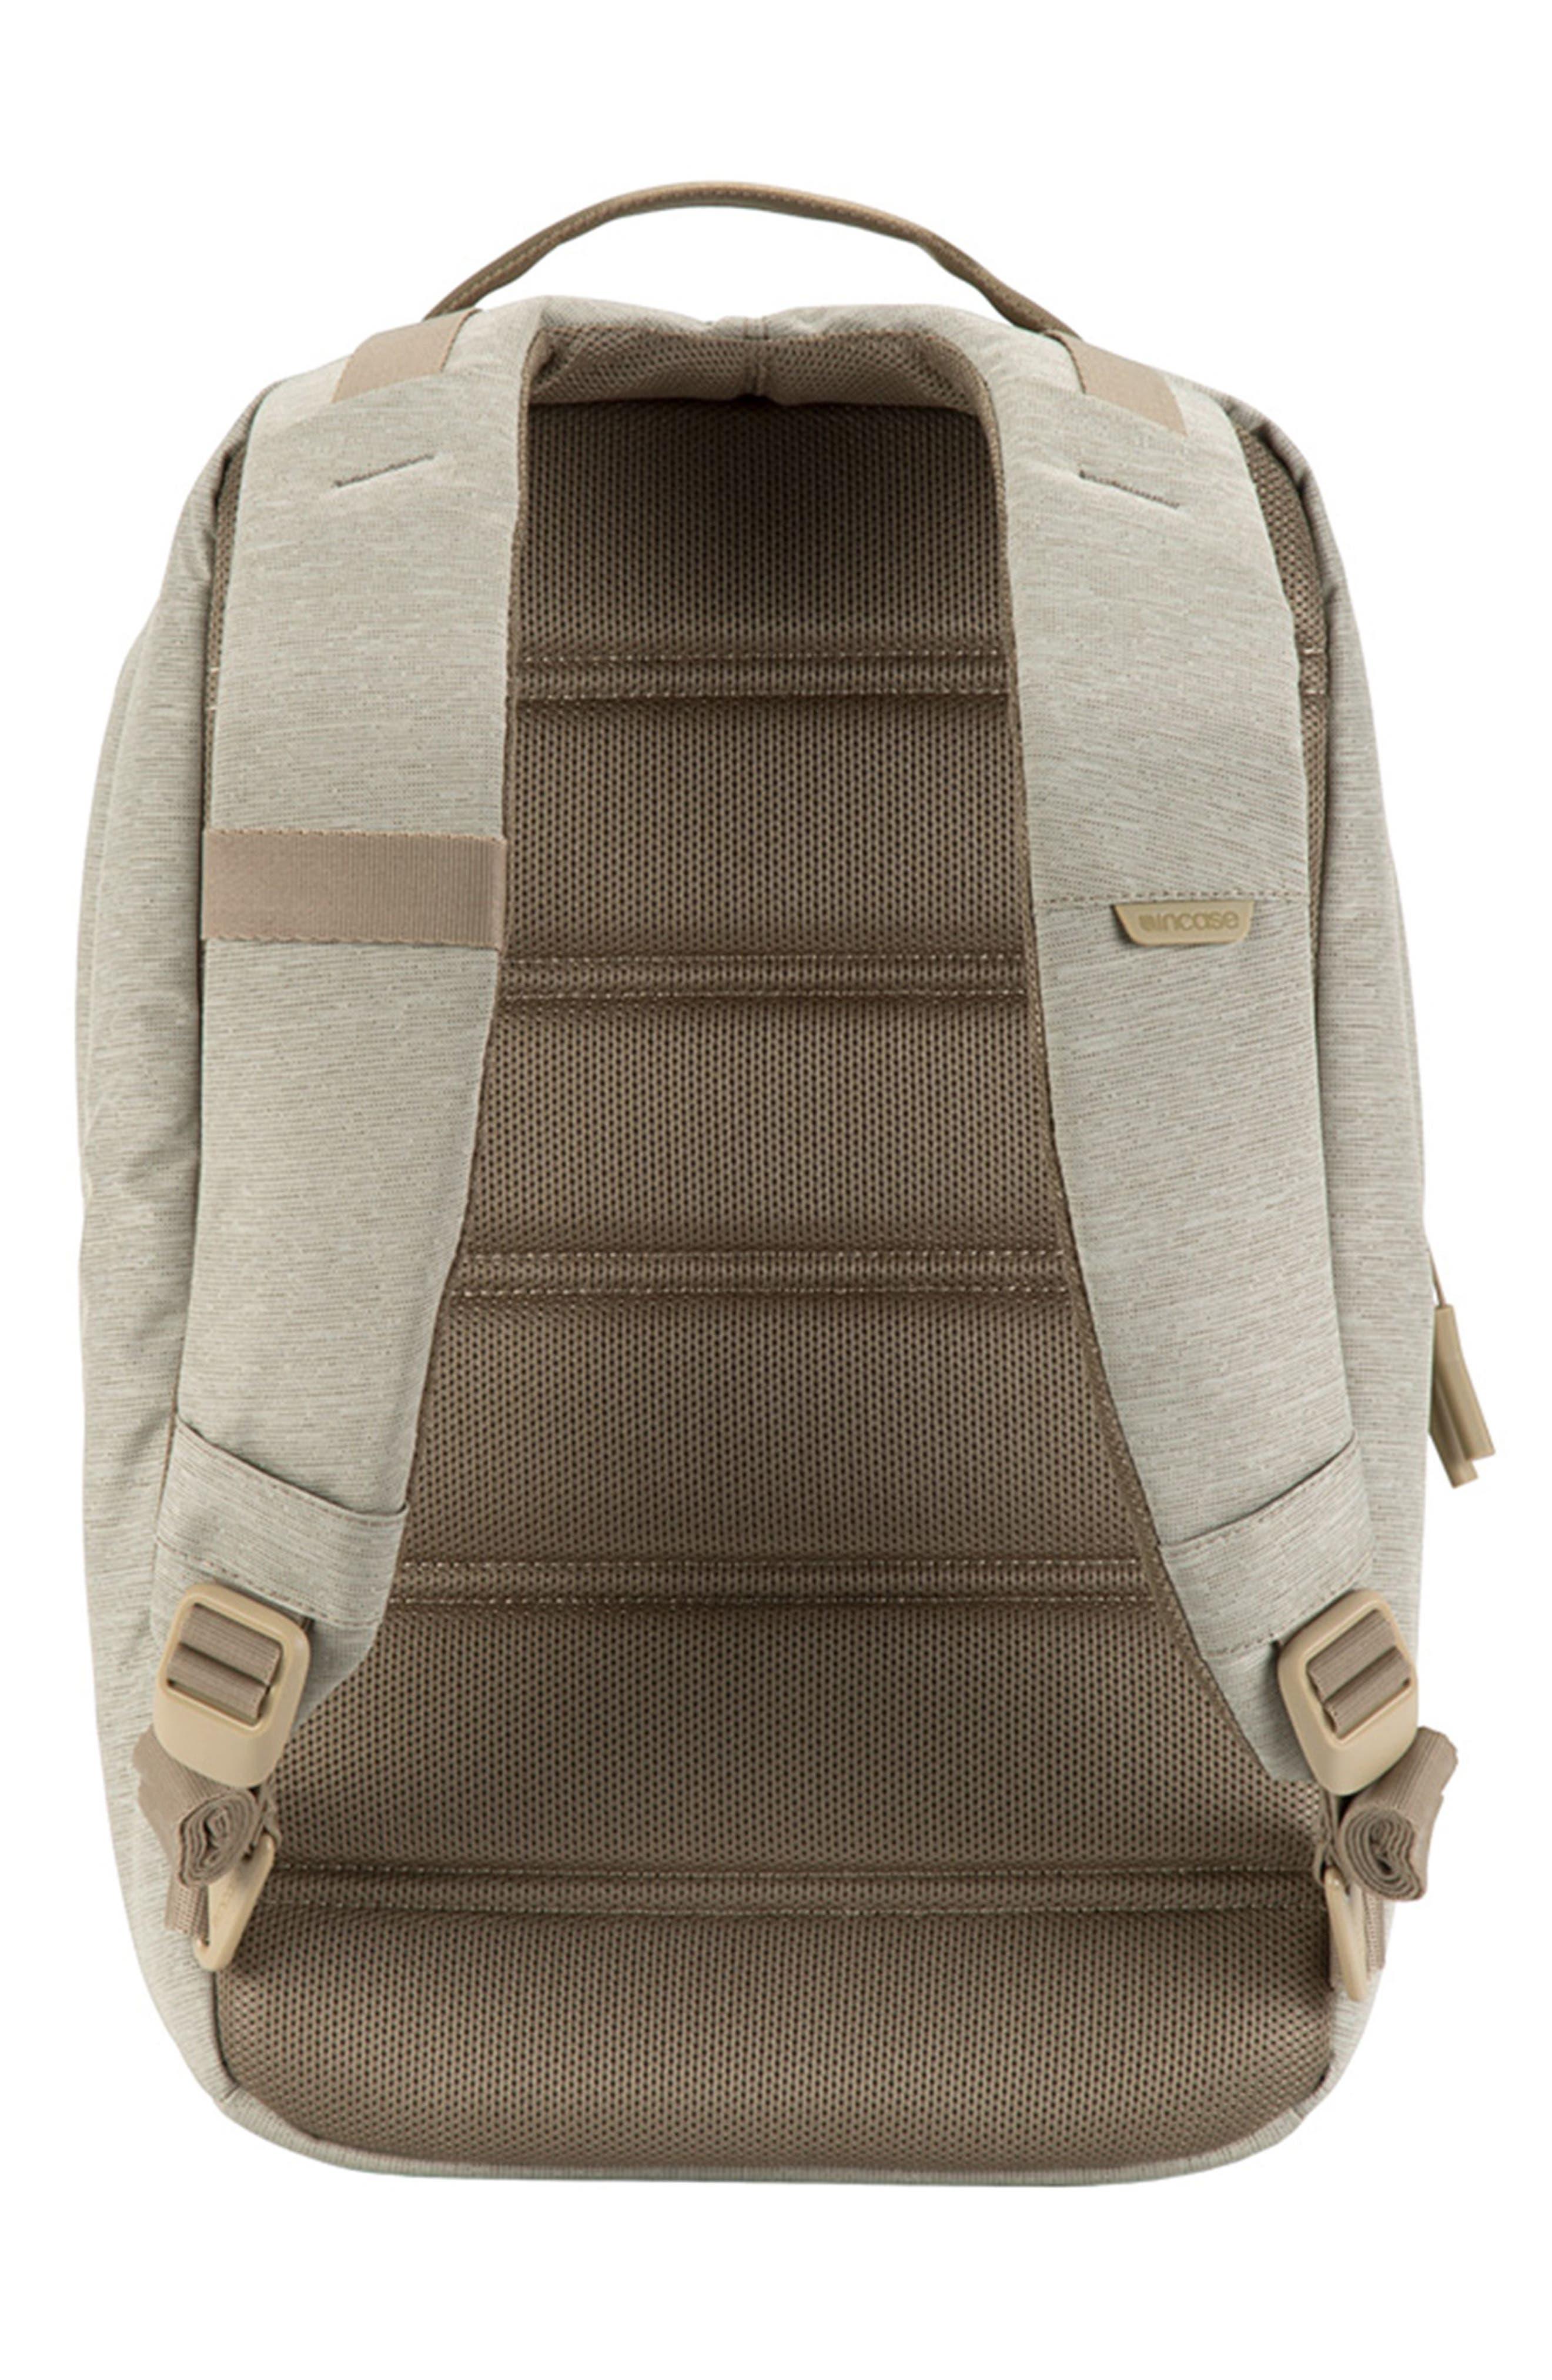 City Compact Backpack,                             Alternate thumbnail 2, color,                             Heather Khaki